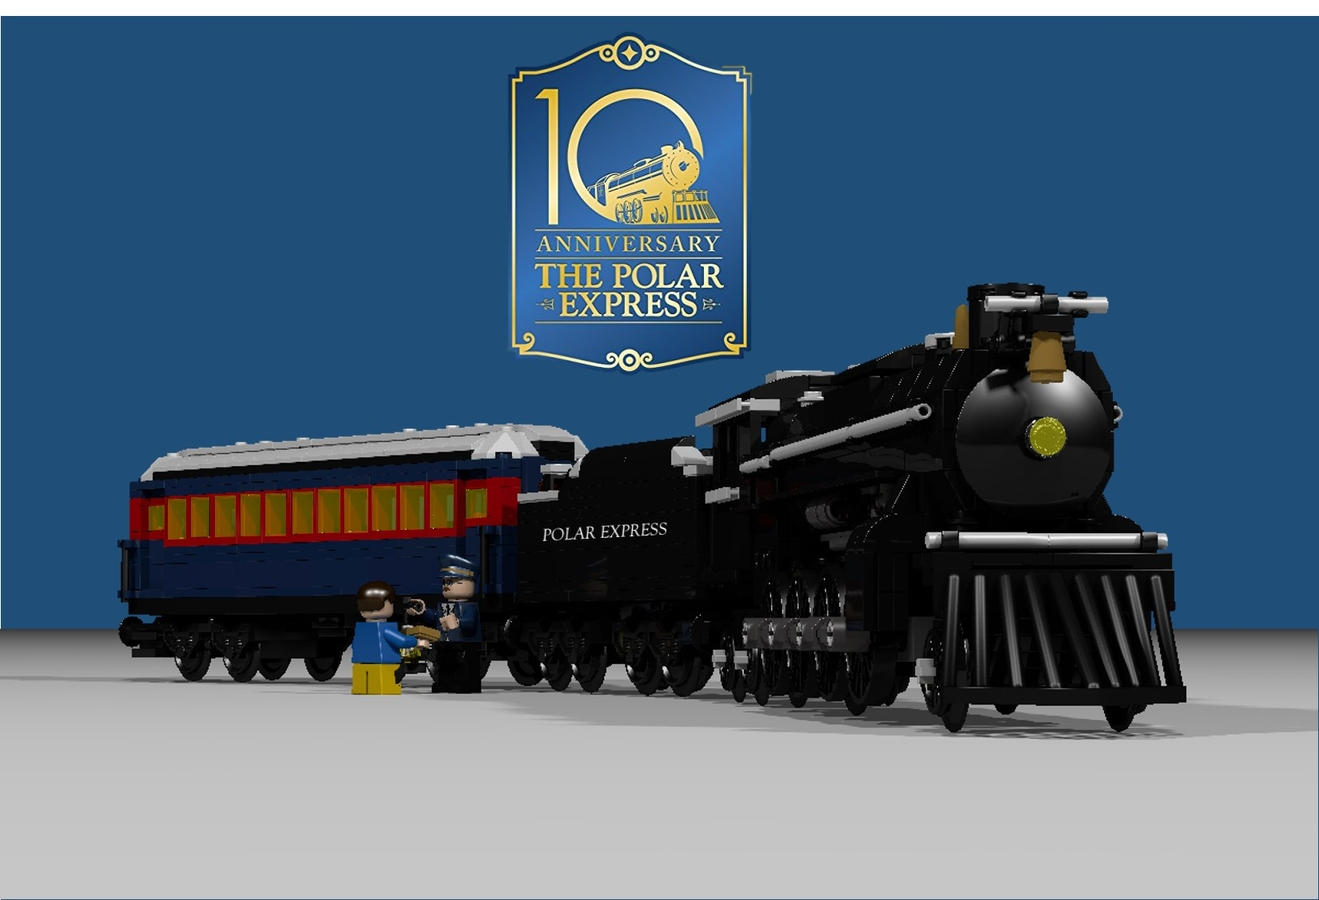 LEGO IDEAS - Product Ideas - The Polar Express 10th Anniversary